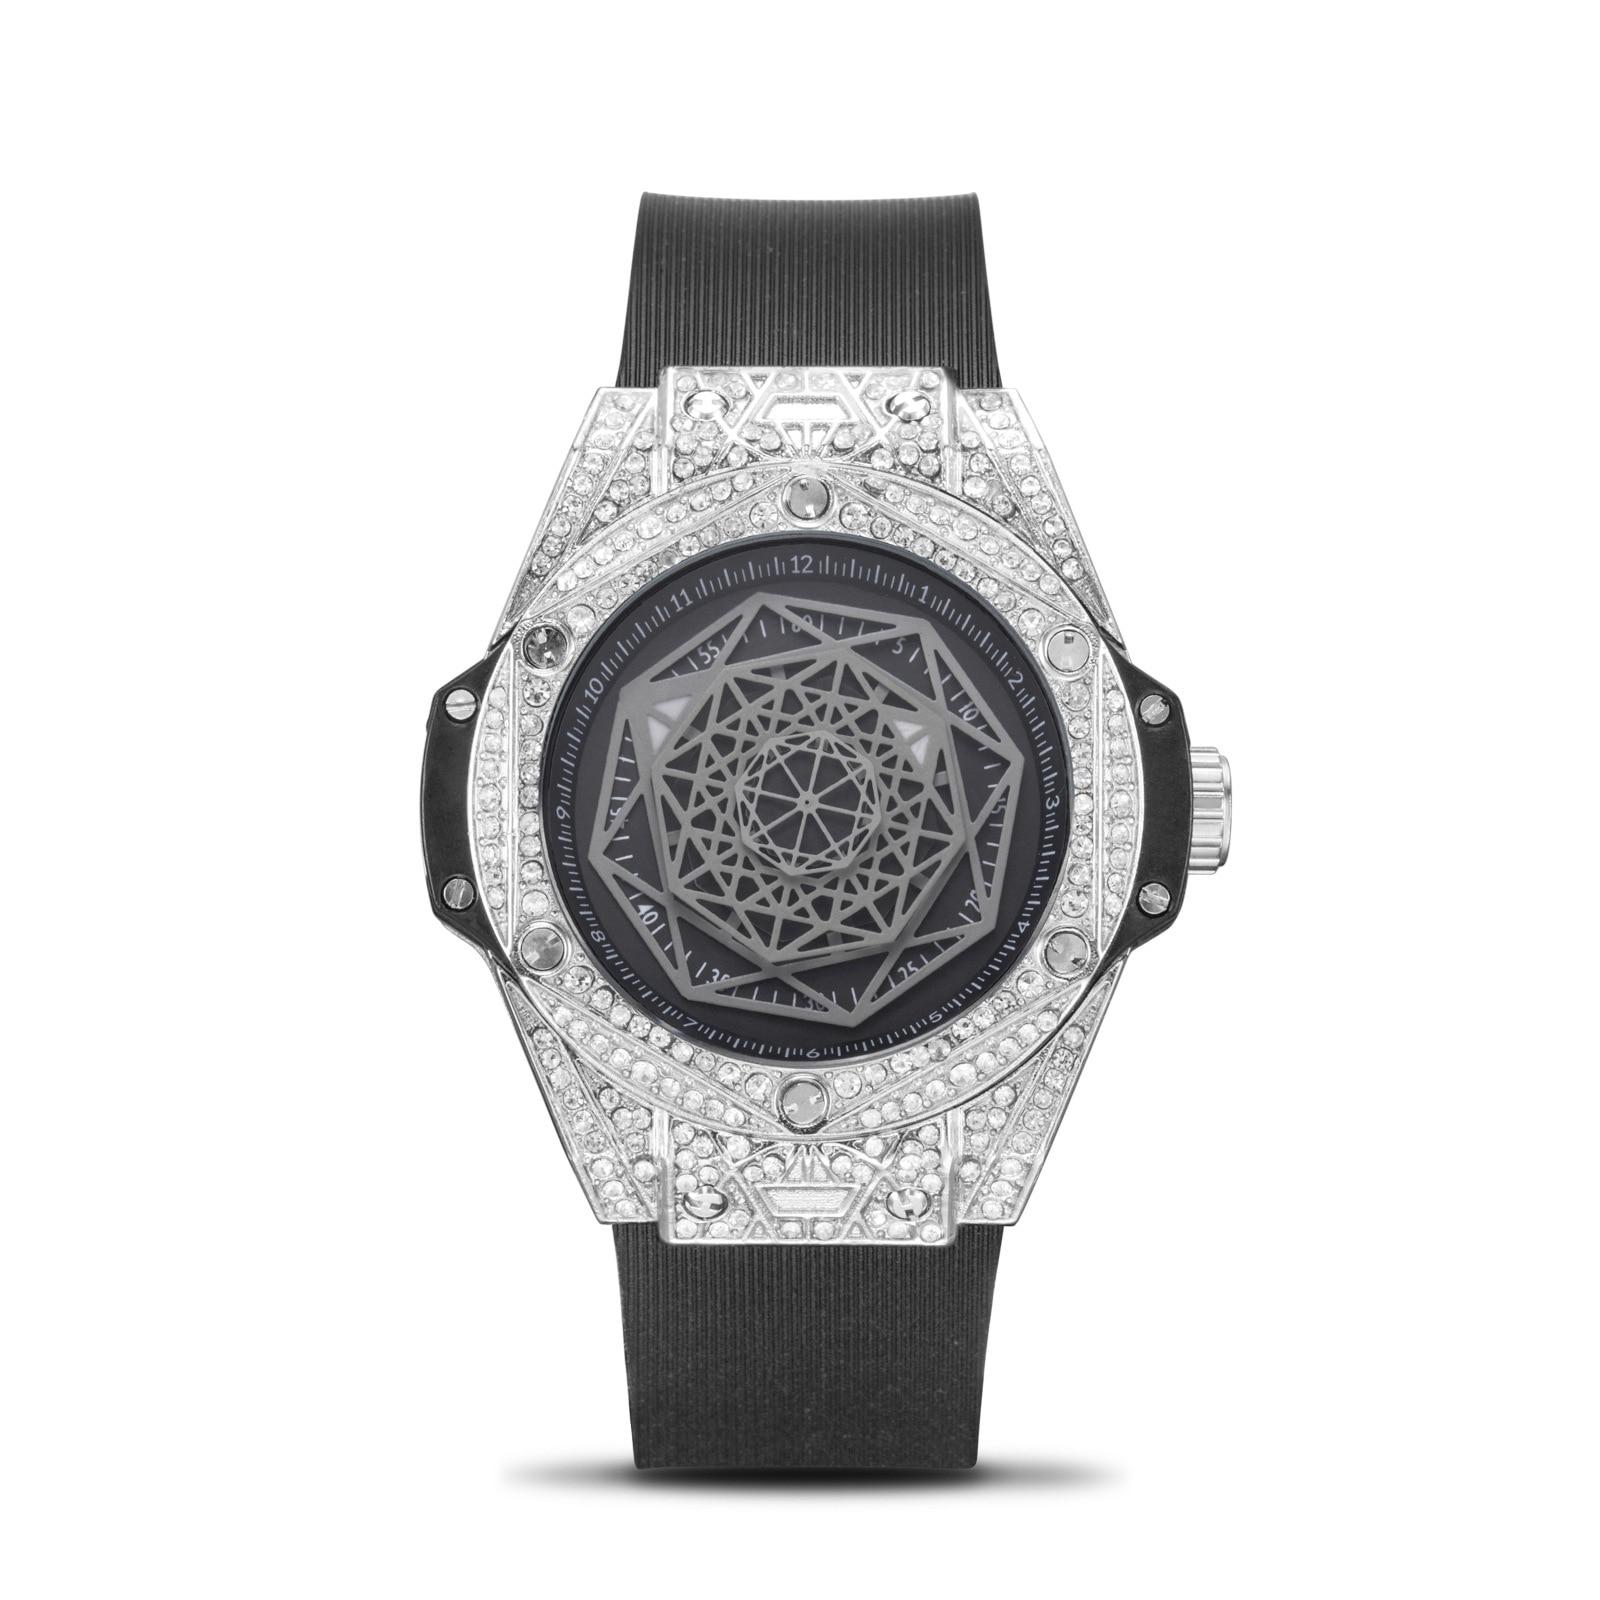 Classic Diamond Mens Sports Watch Waterproof Black Steel Case Men's Quartz Watches Clock Male Casual WristWatch Reloj Relogio